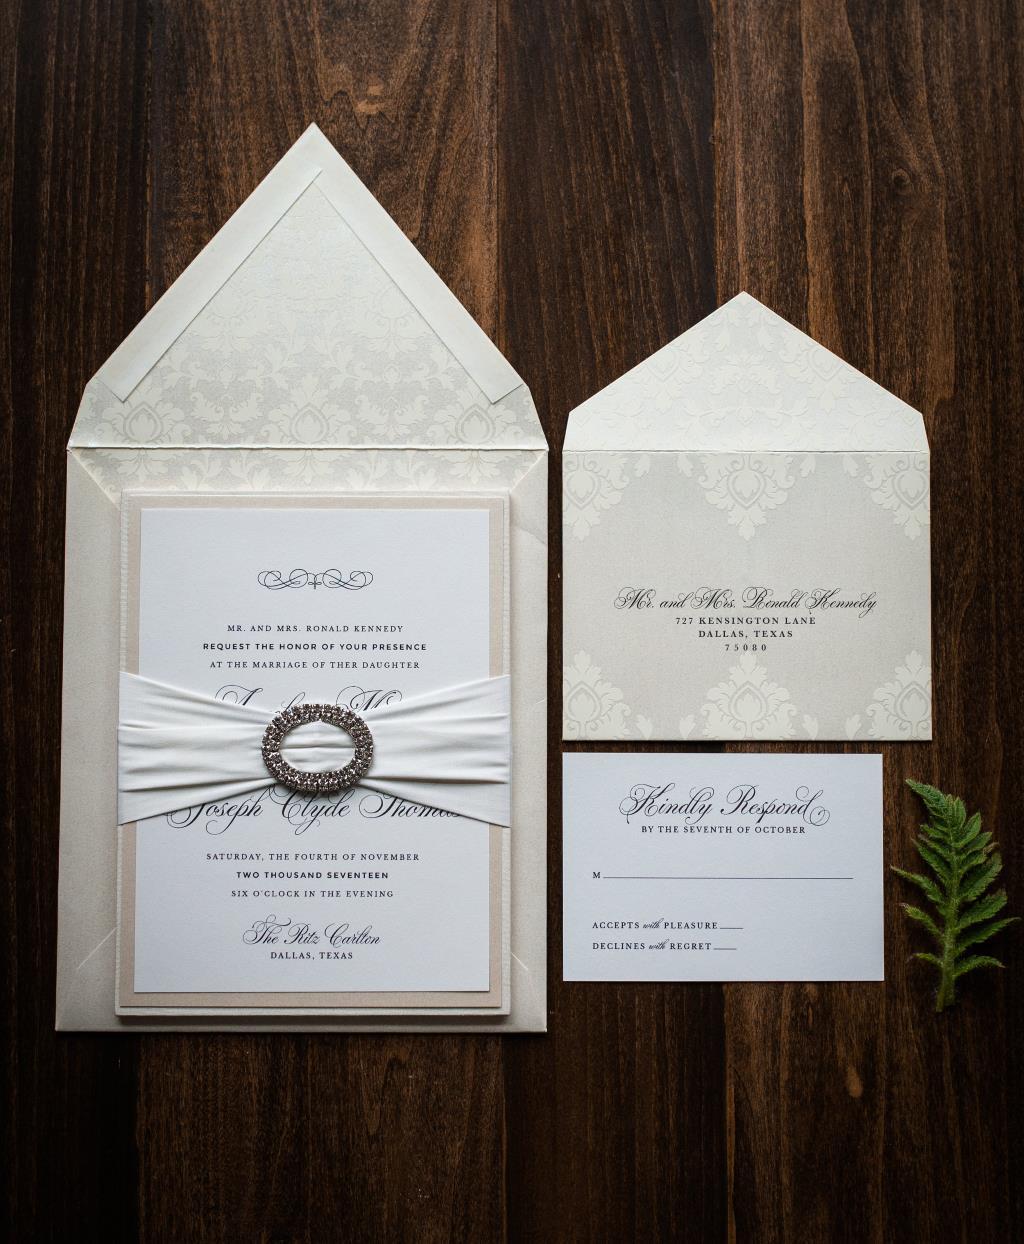 ELEGANT SILK BOARD WEDDING INVITATIONS